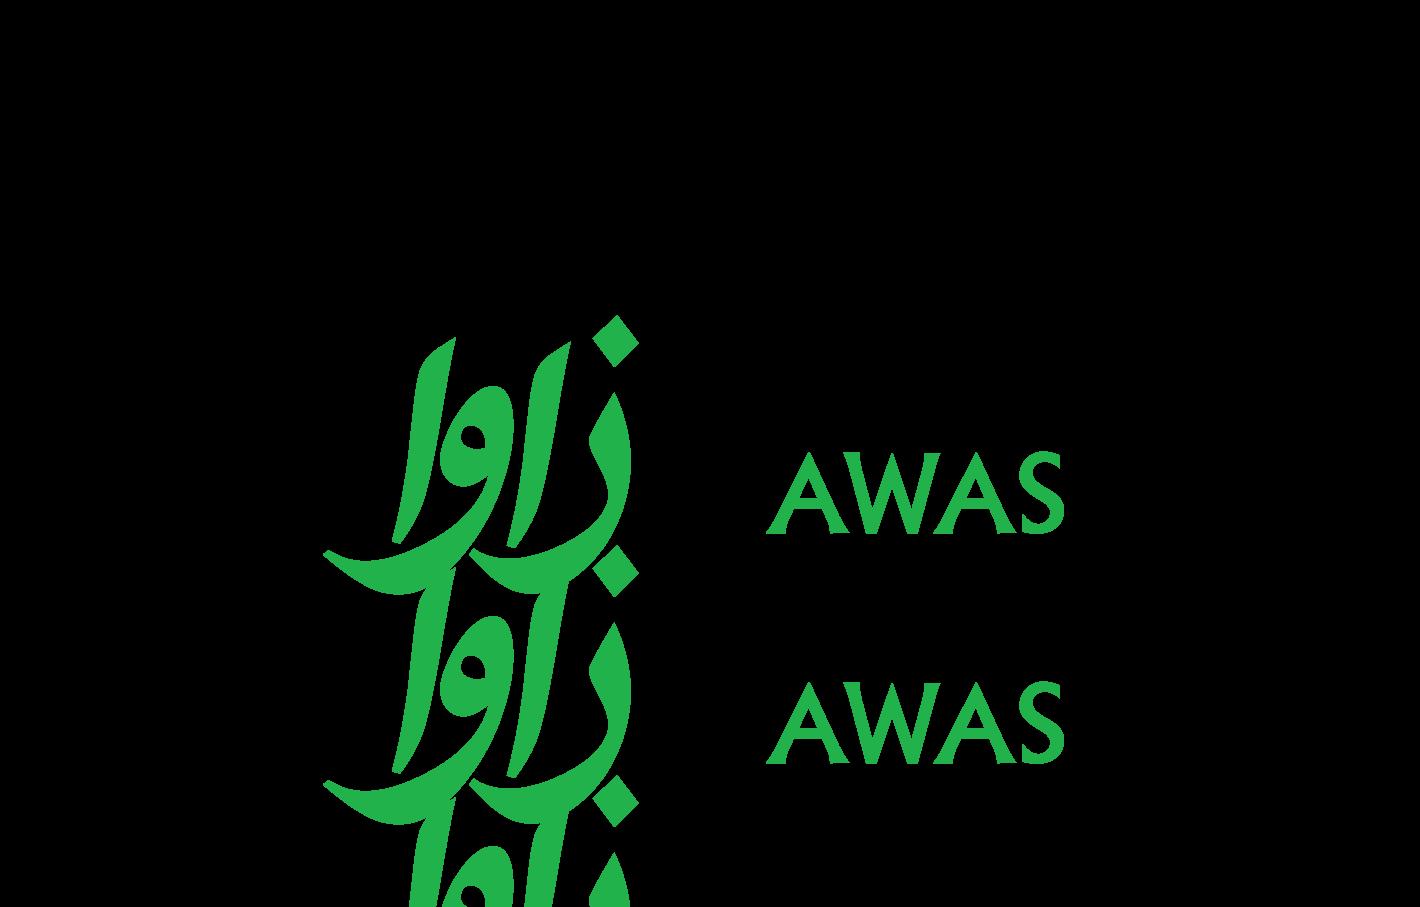 Logo Design by Private User - Entry No. 41 in the Logo Design Contest AWAS Logo Design.